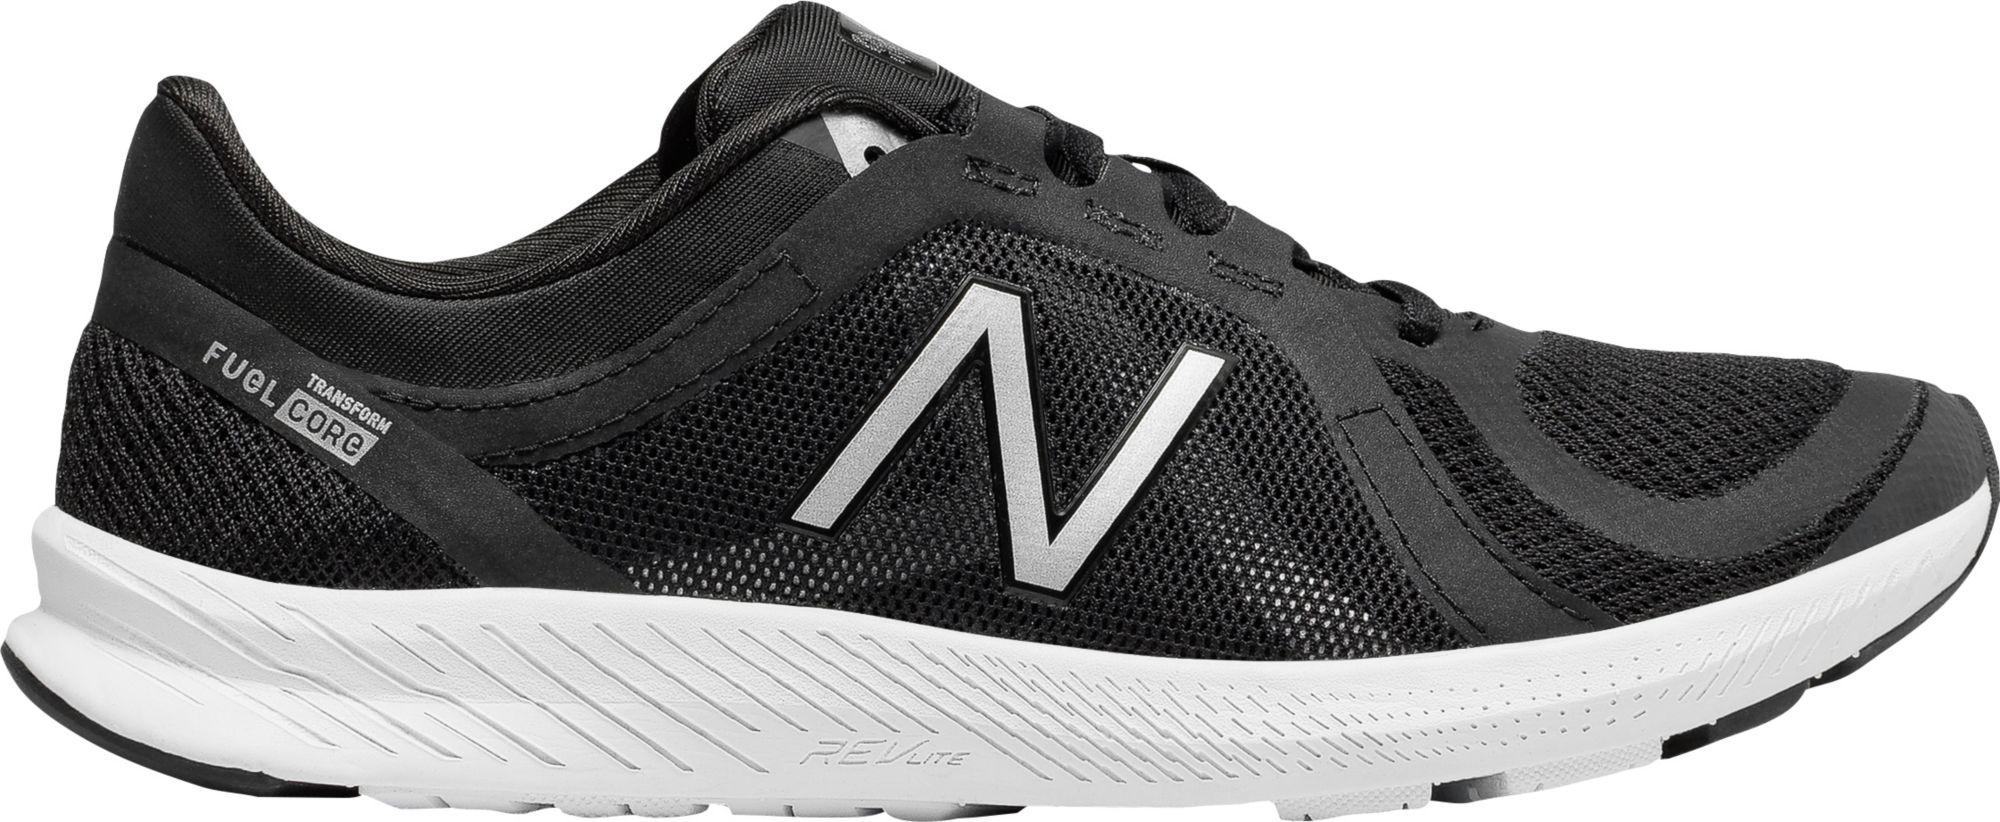 new balance training schoenen